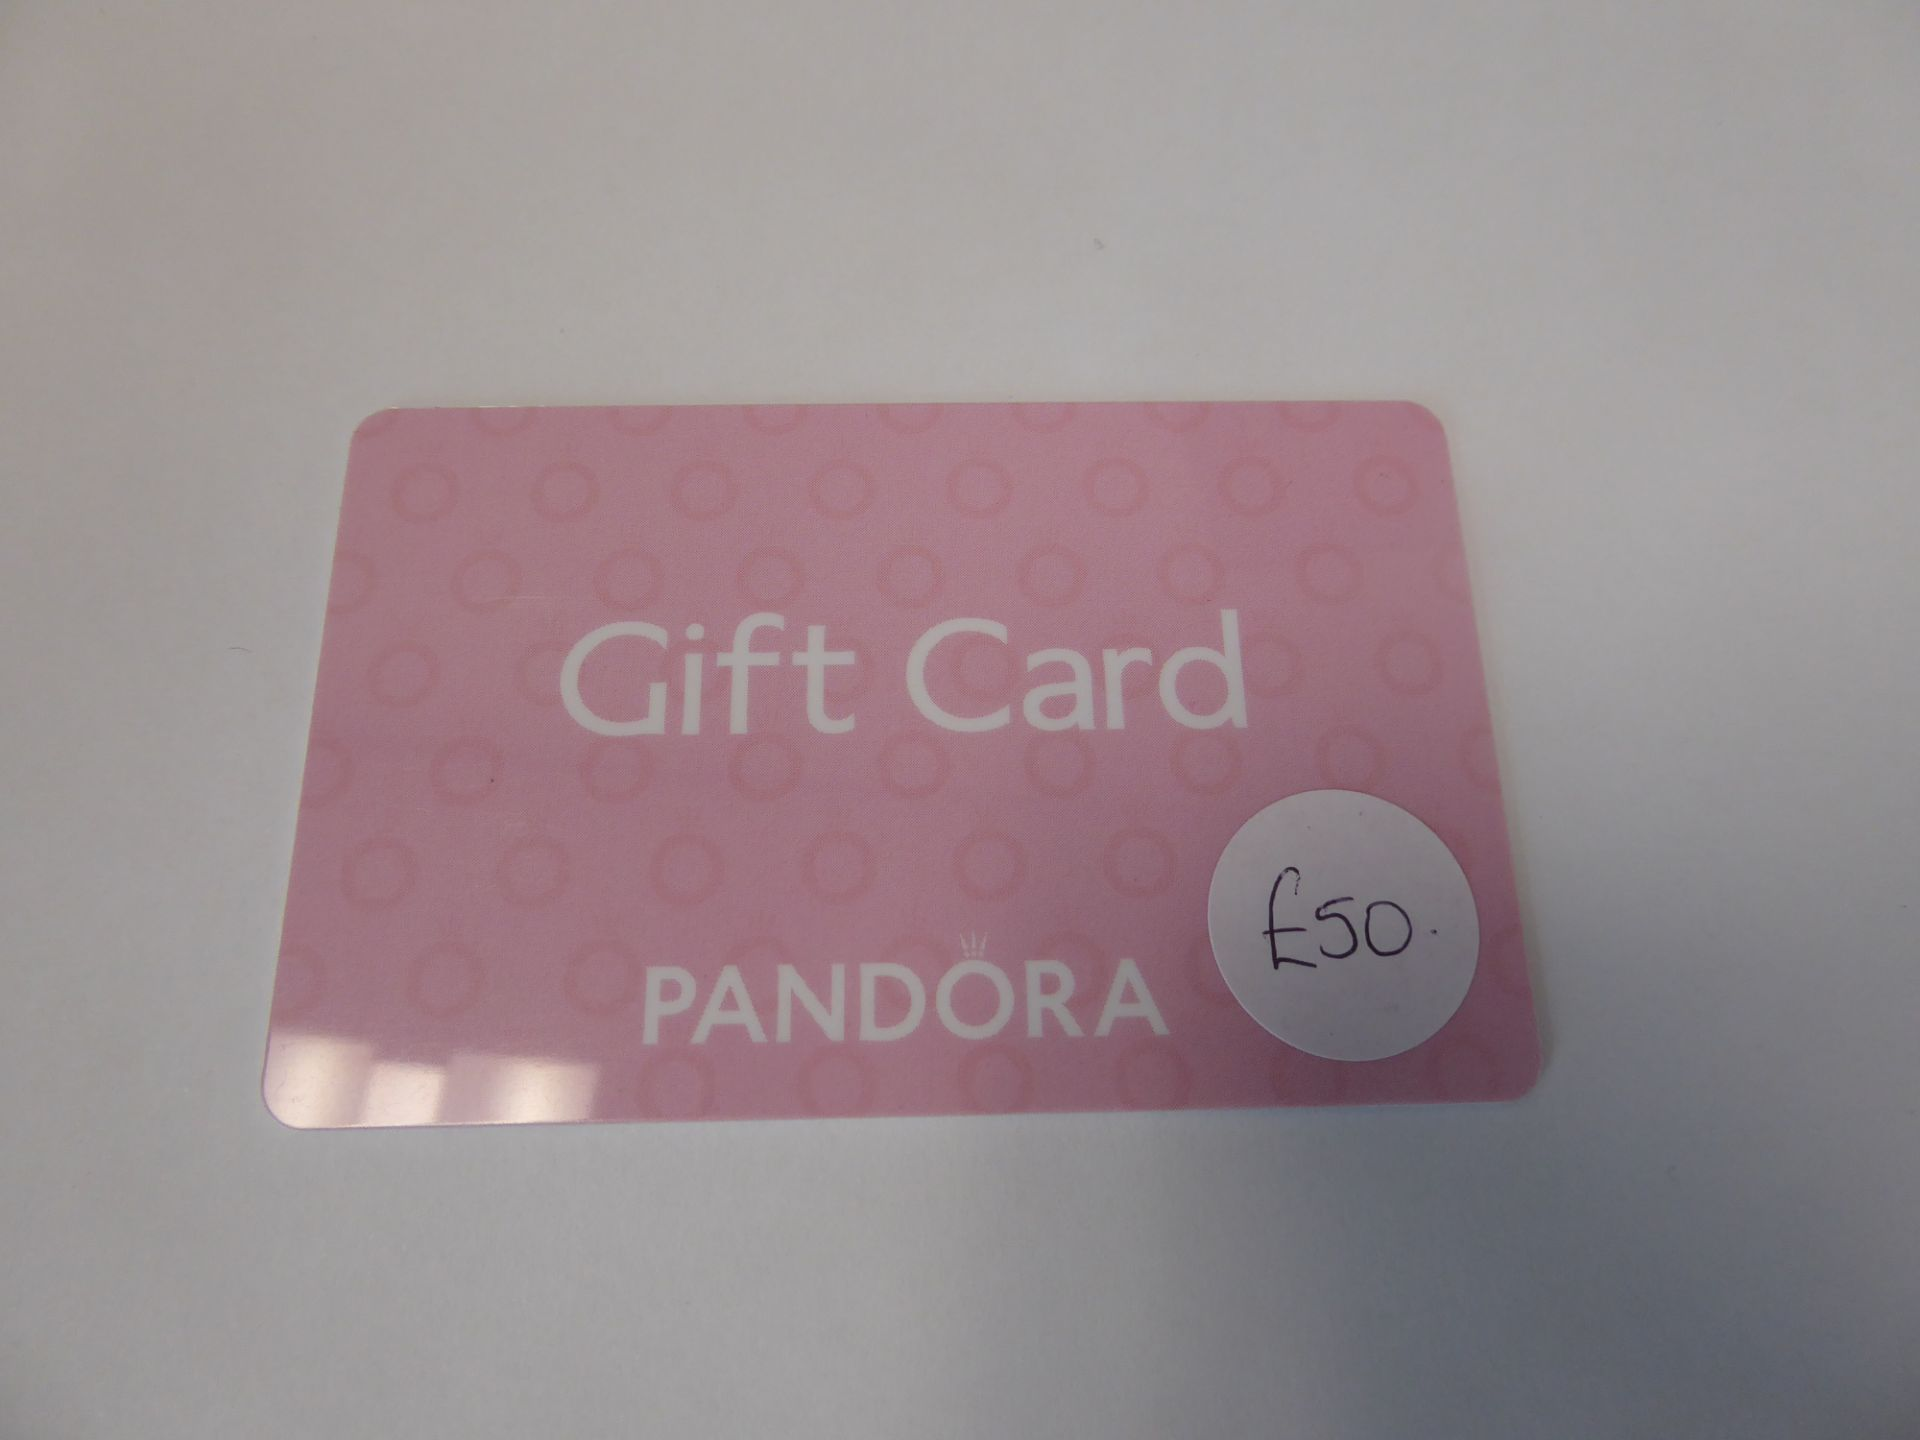 Pandora (x1) - Total face value £50